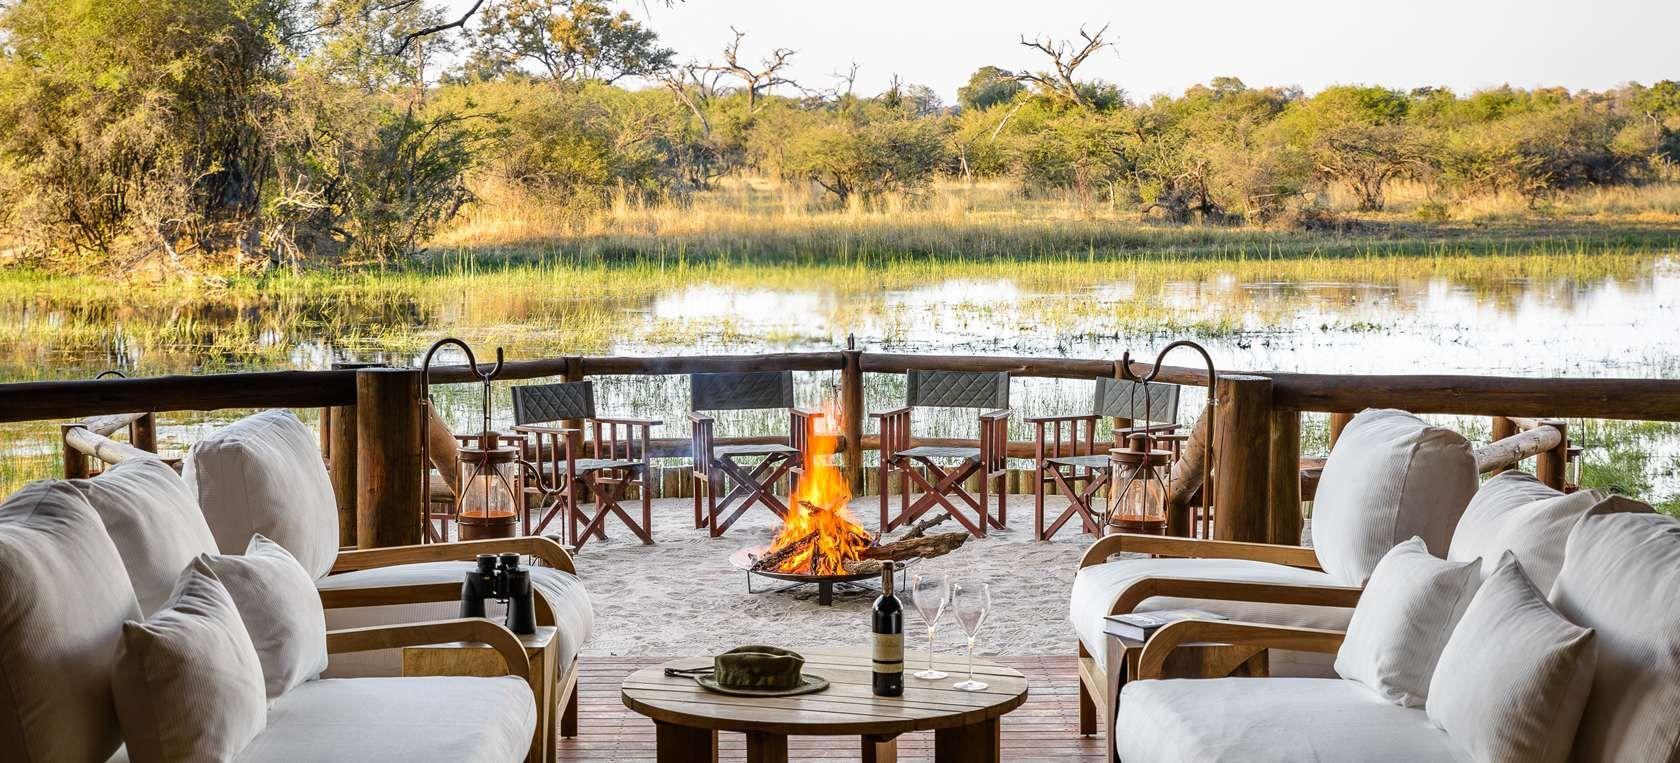 Sanctuary Stanley's Camp Botswana All inclusive